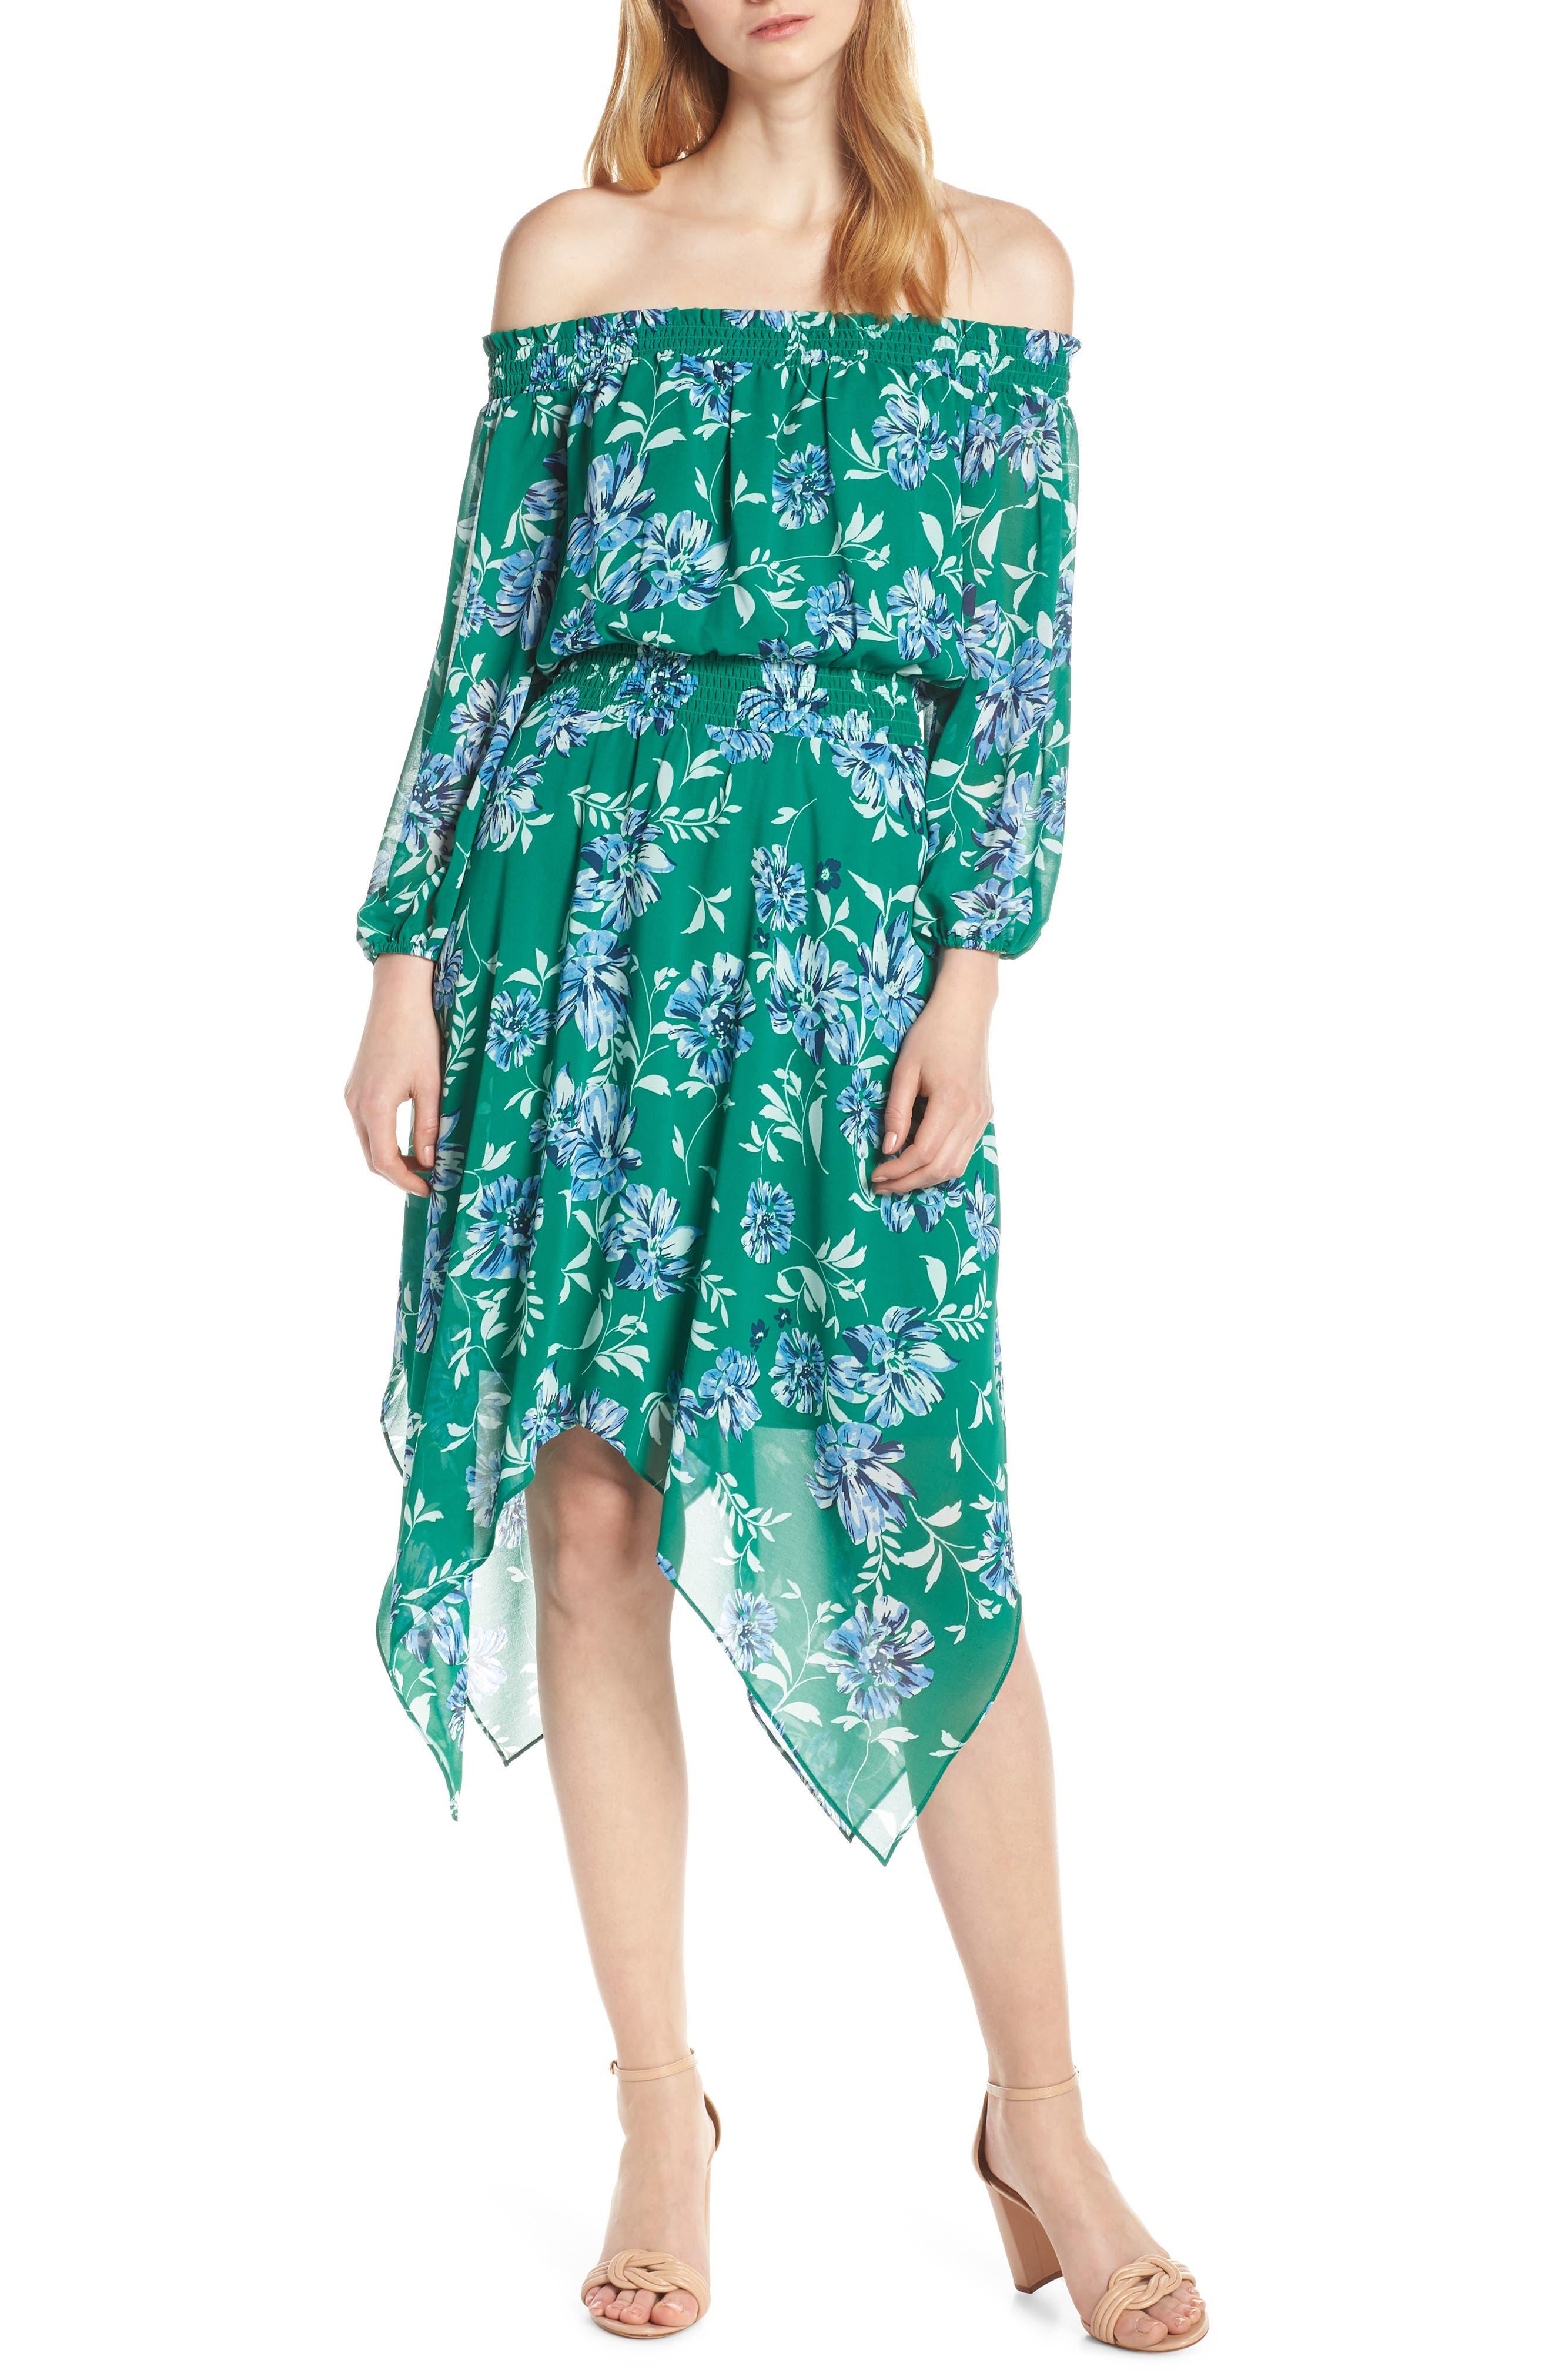 CHARLES HENRY Smocked Handkerchief Hem Dress, Main, color, KELLY GREEN FLORAL